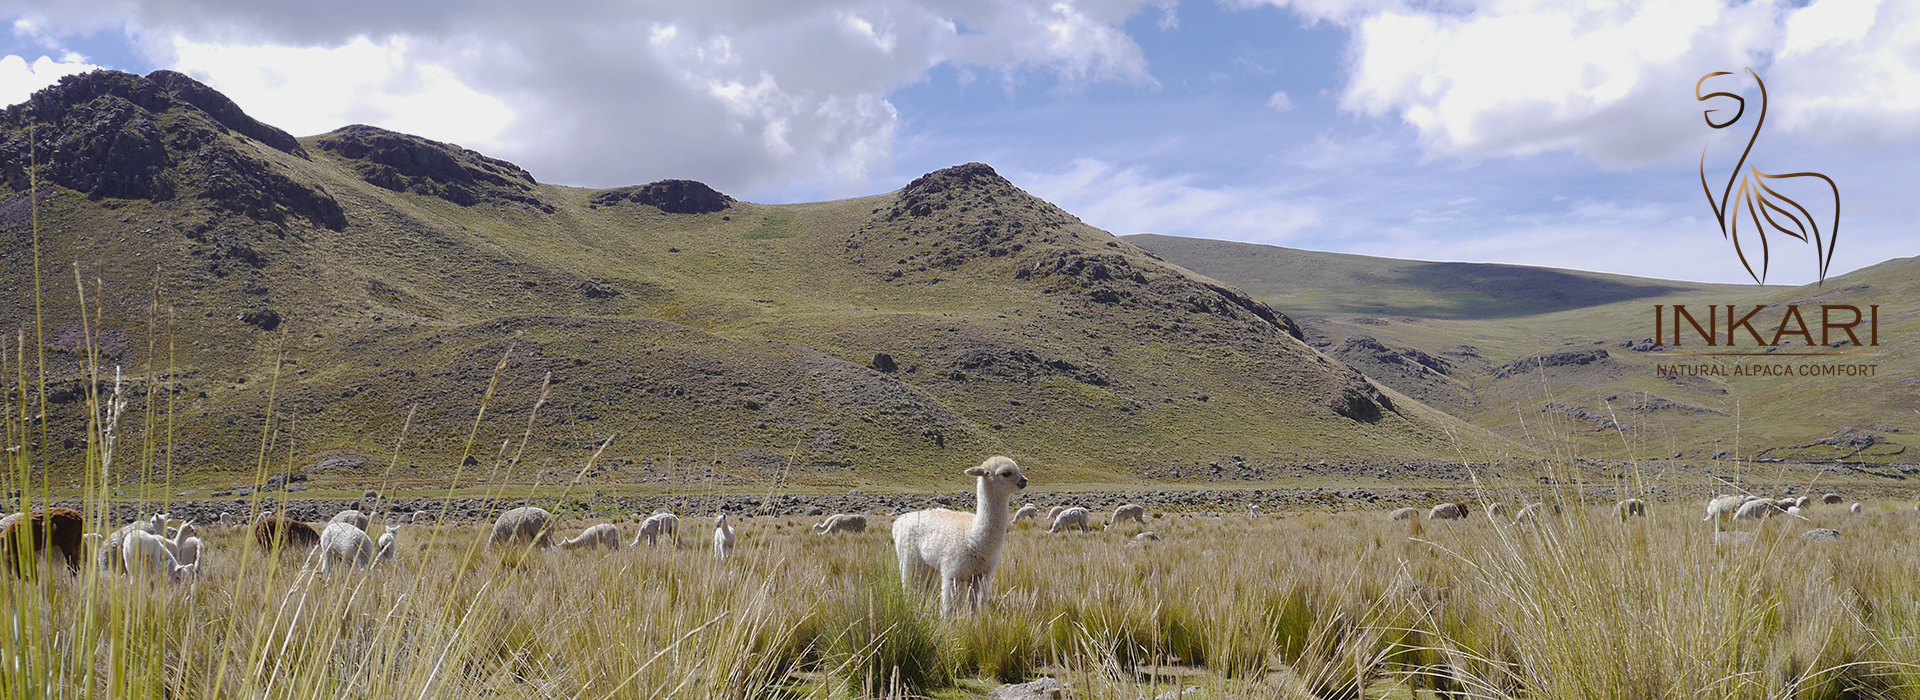 baby alpaca in peruvian Andes - by Inkari